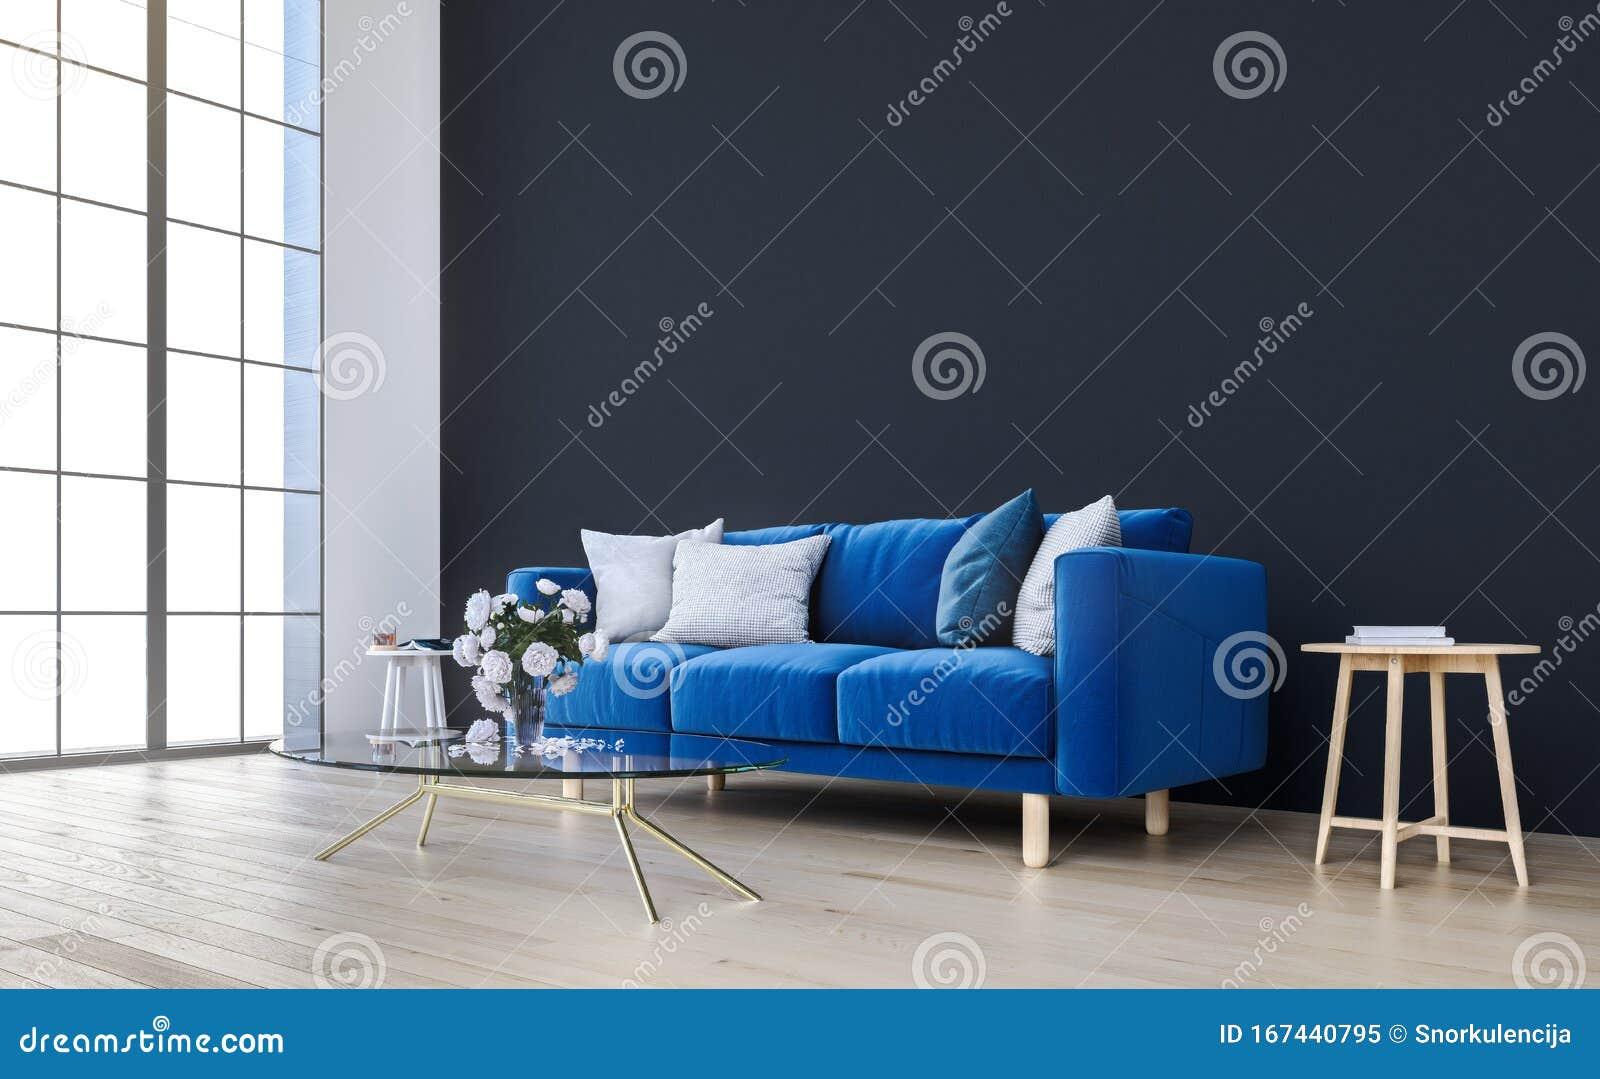 Mock Up Wall With Royal Blue Sofa In Modern Interior Background Living Room Scandinavian Style Stock Illustration Illustration Of Decor Mockup 167440795